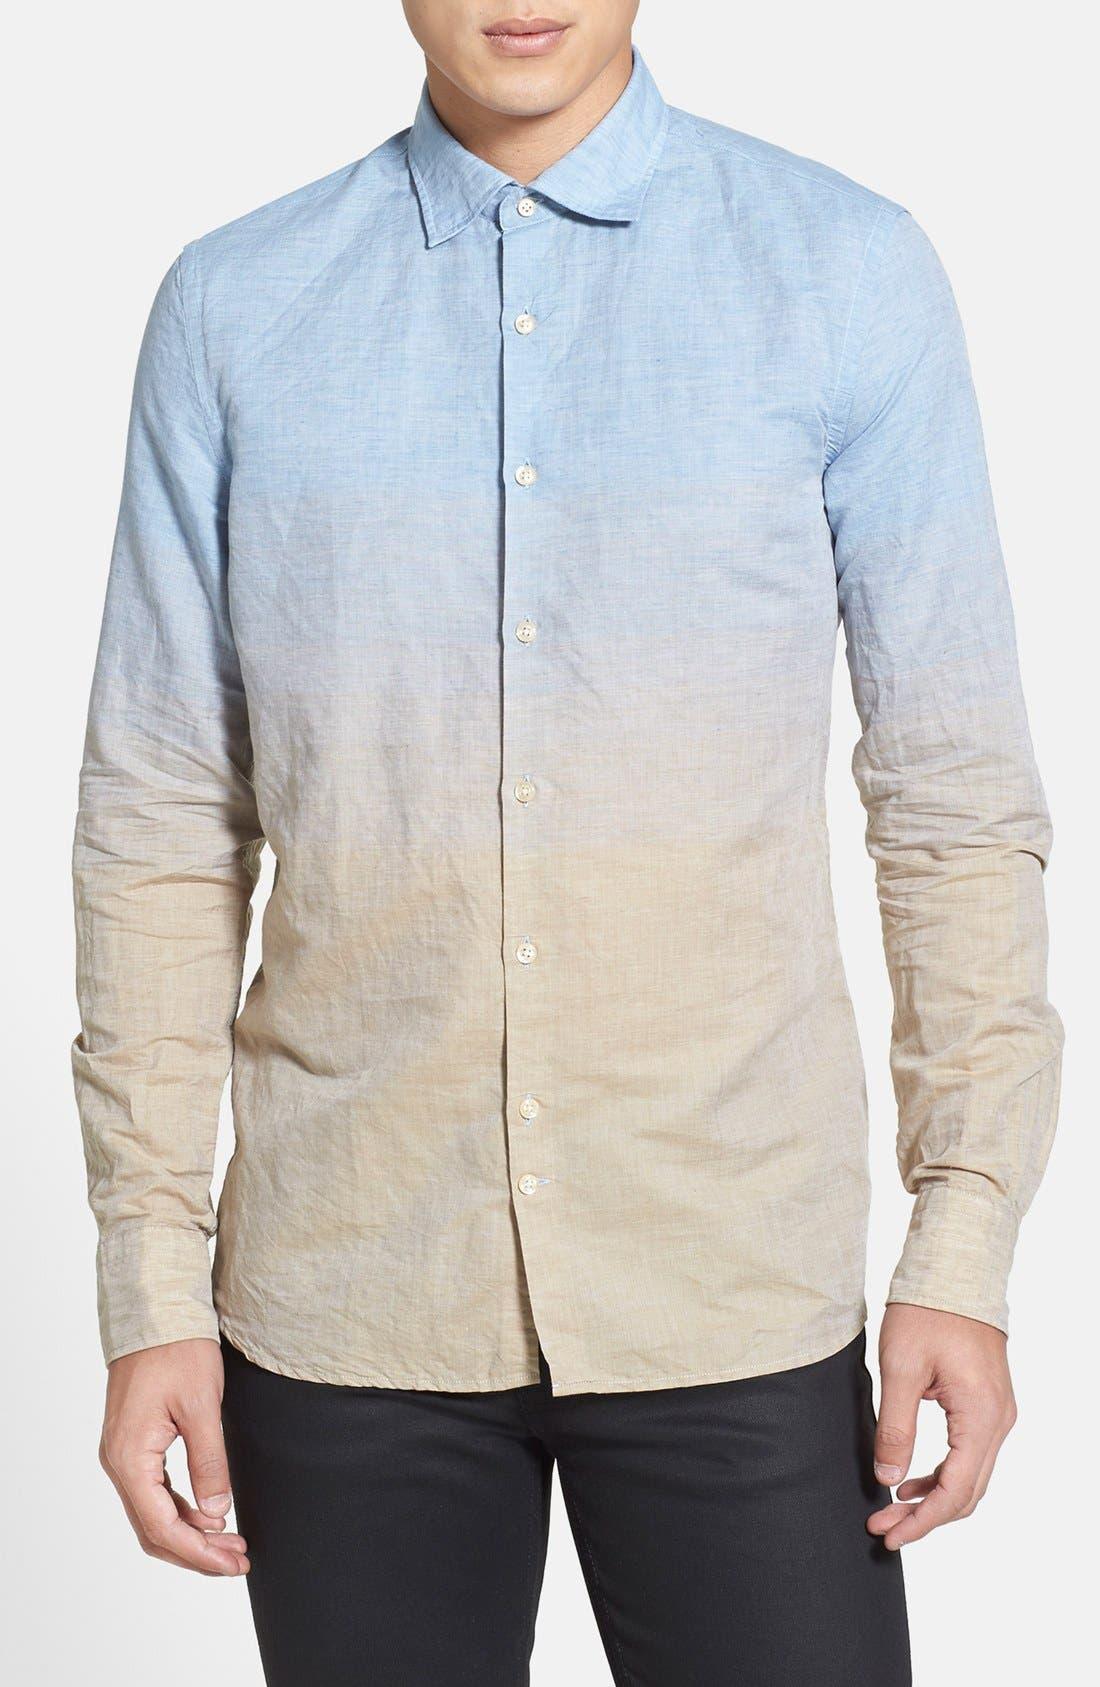 Alternate Image 1 Selected - J. Lindeberg 'Dani 42 - Sunrise' Slim Fit Sport Shirt